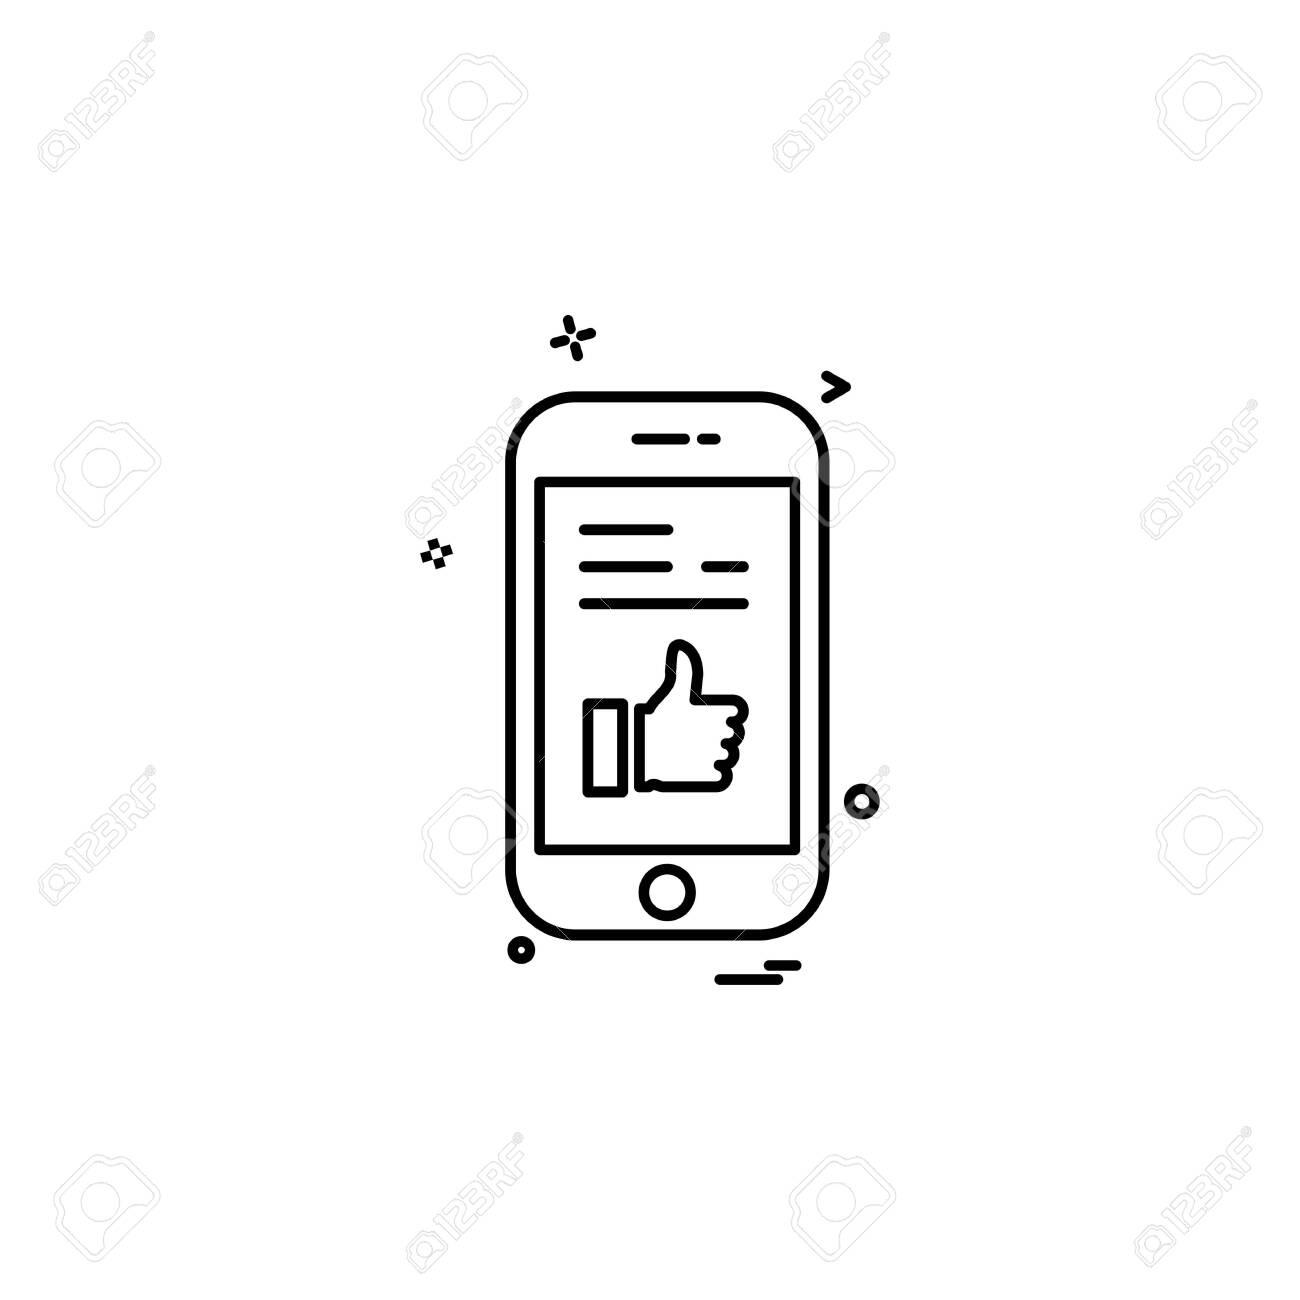 Smart phone icon design vector - 148008302